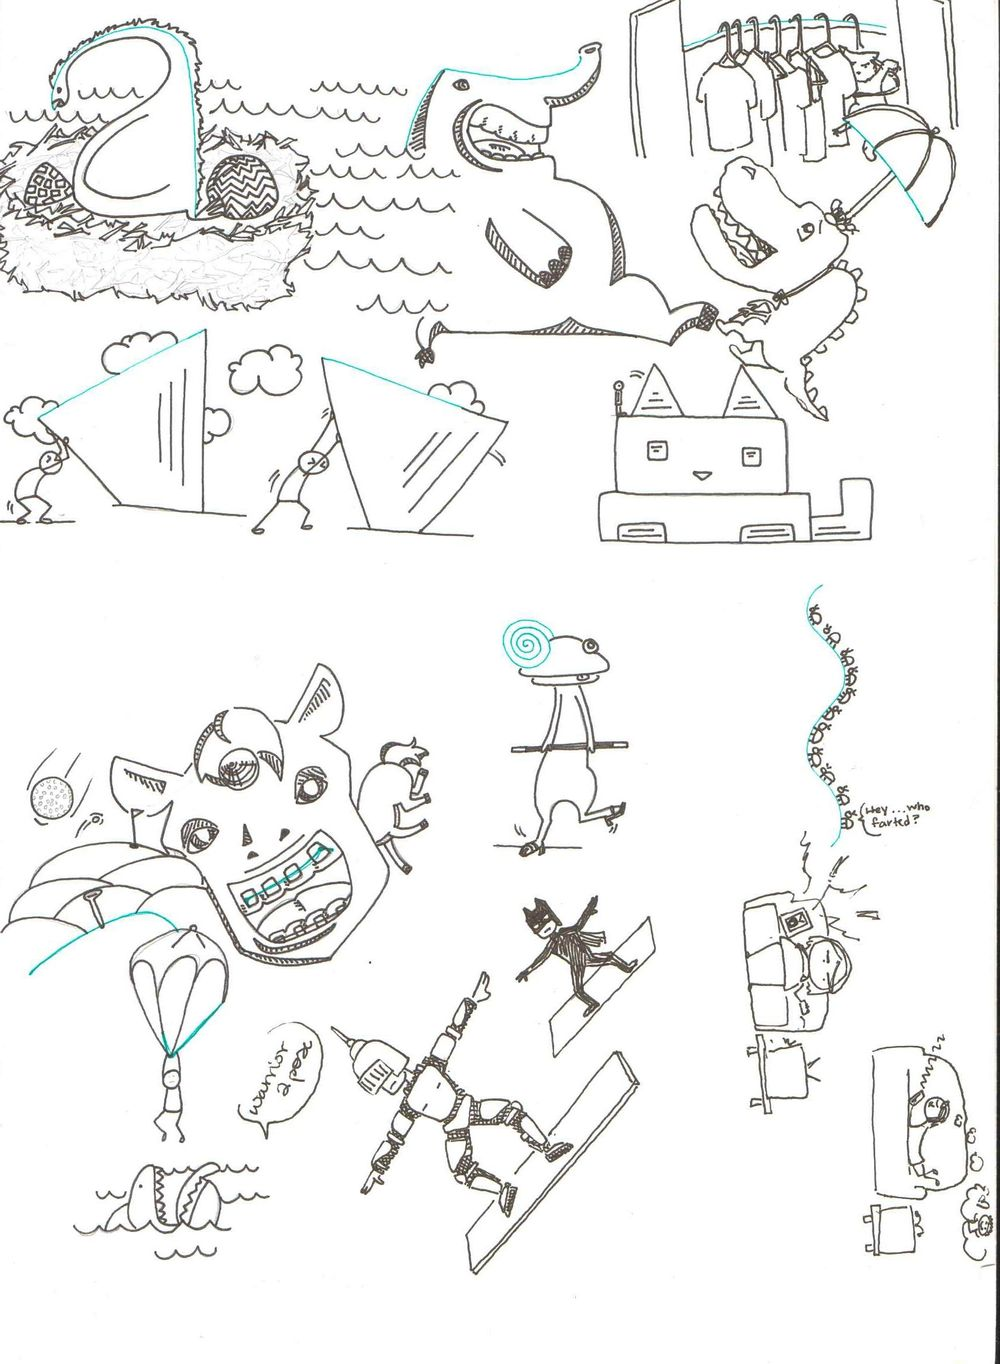 Doodlesheet - image 2 - student project